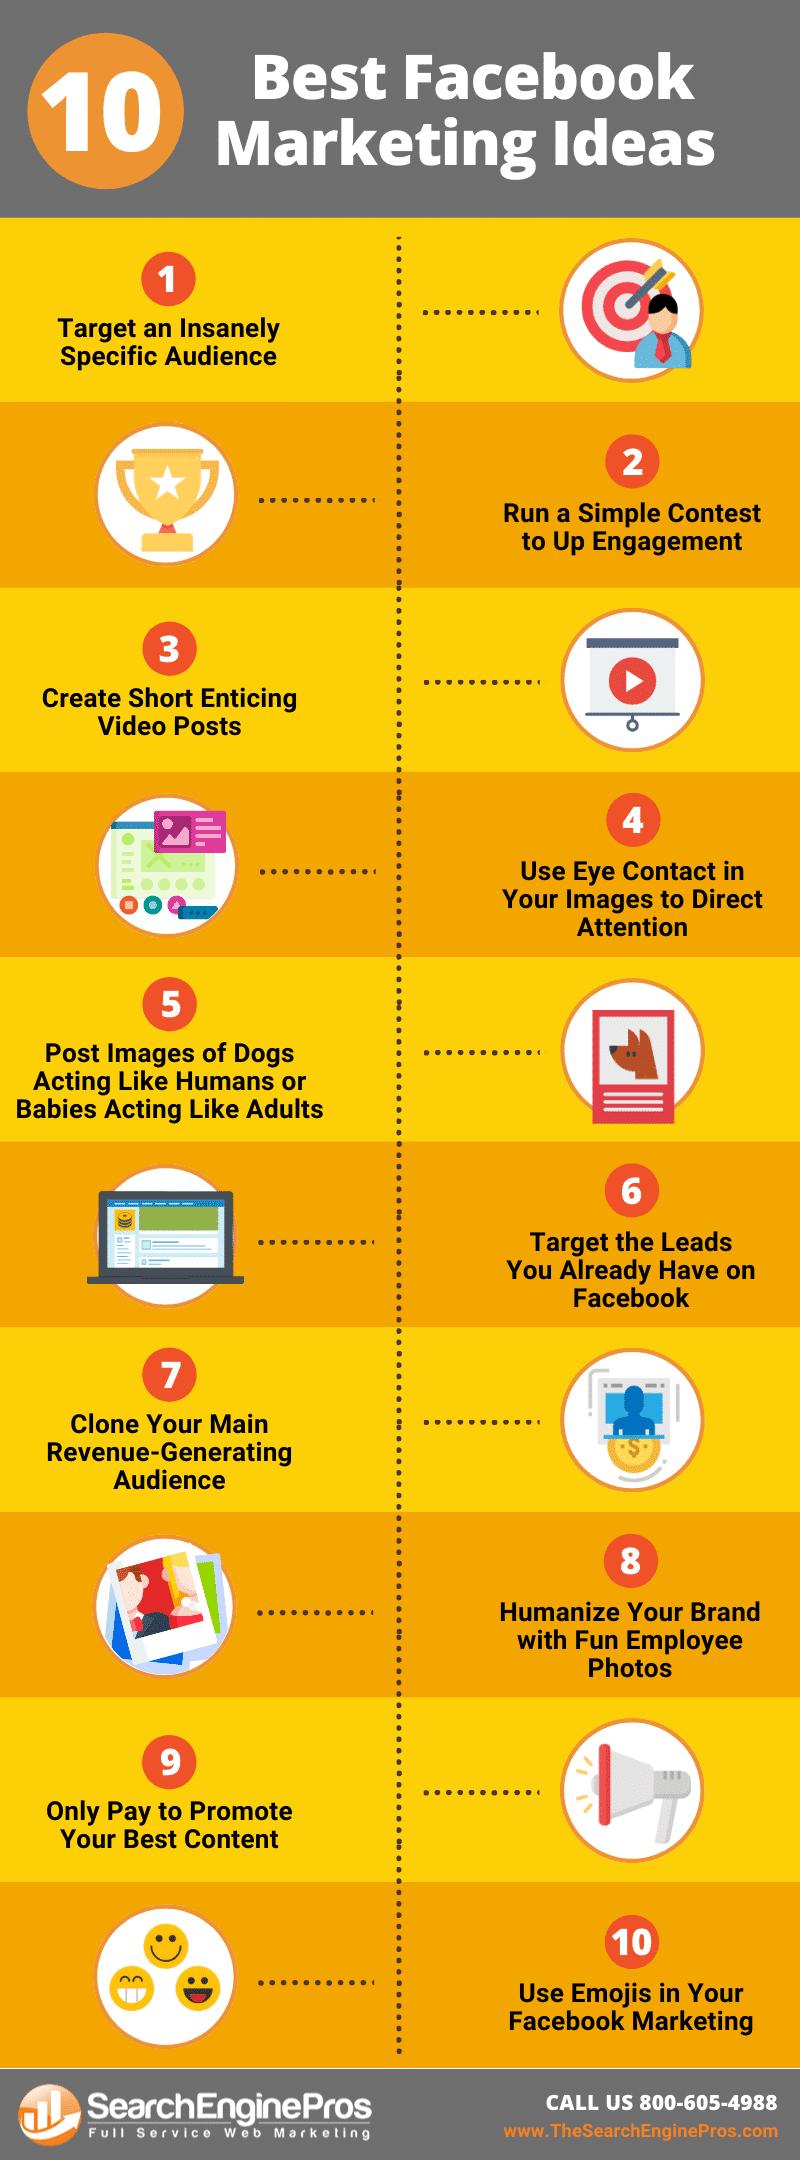 Best Facebook Marketing Ideas